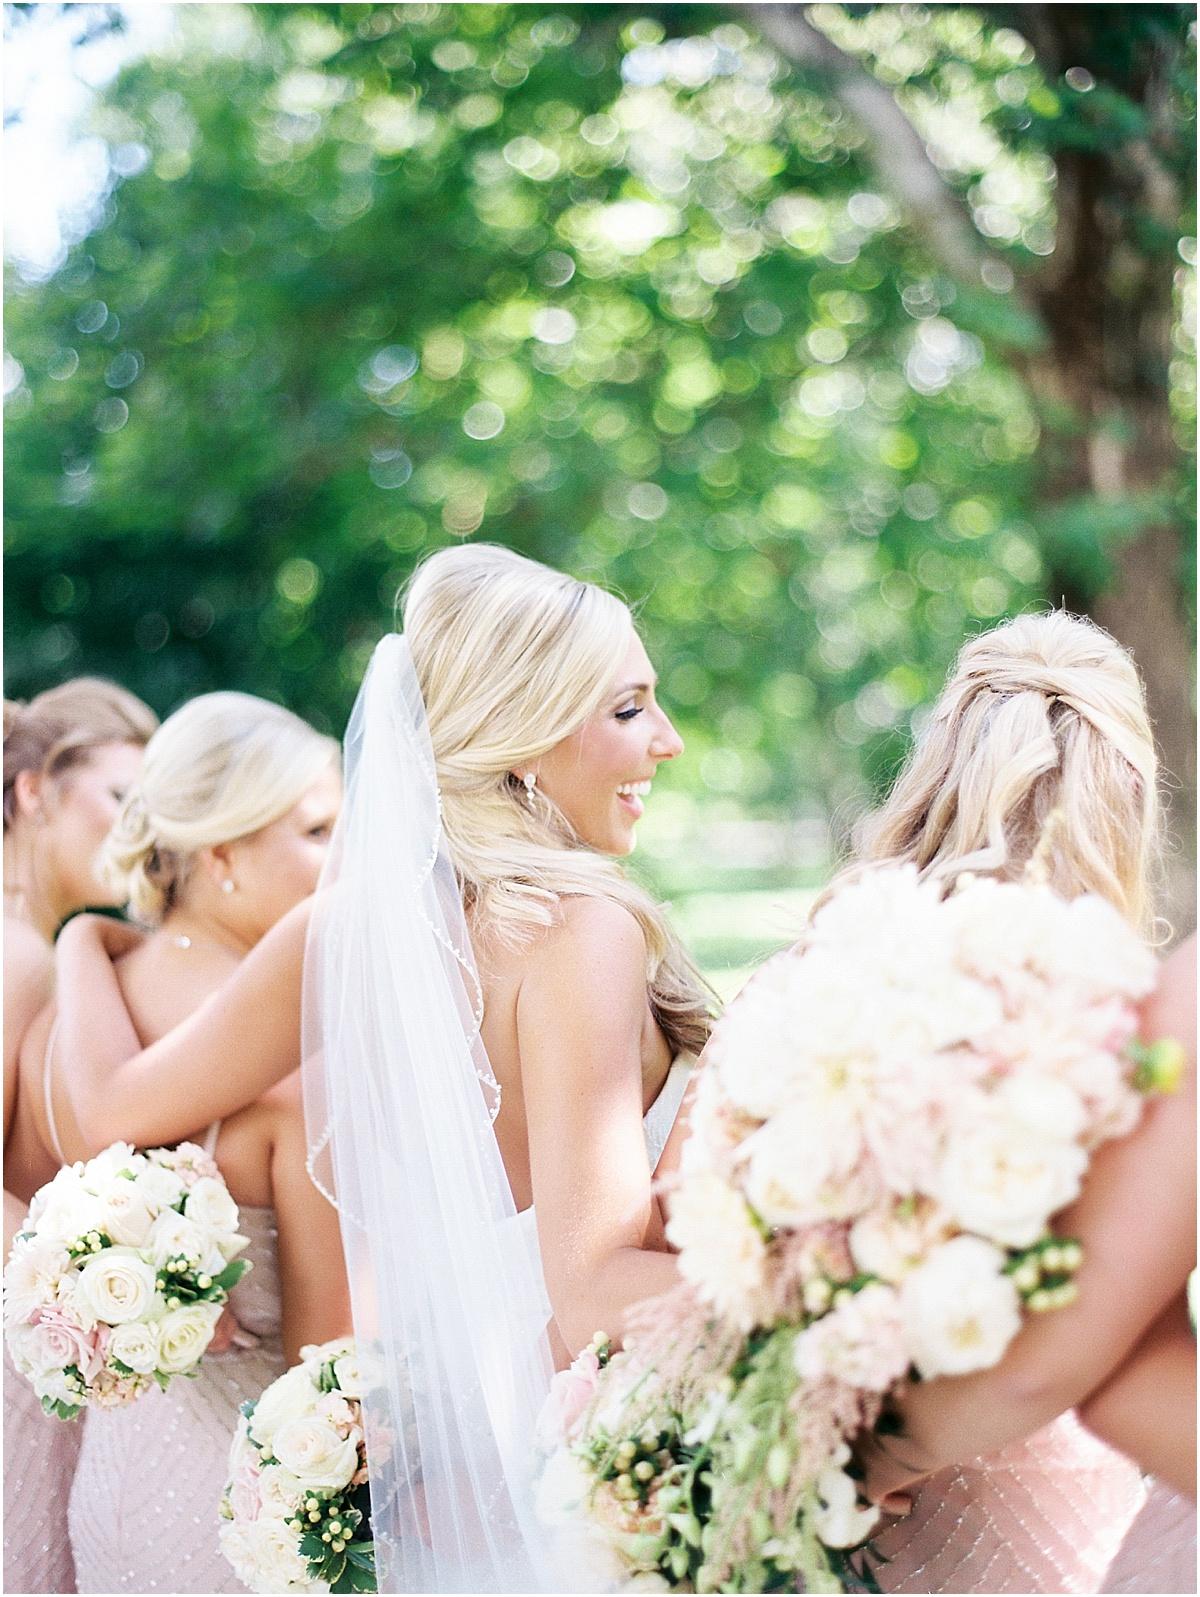 St_Louis_Wedding_Fine_Art_Film_Photographer_Jordan_Brittley_(www.jordanbrittley.com)_0020.jpg